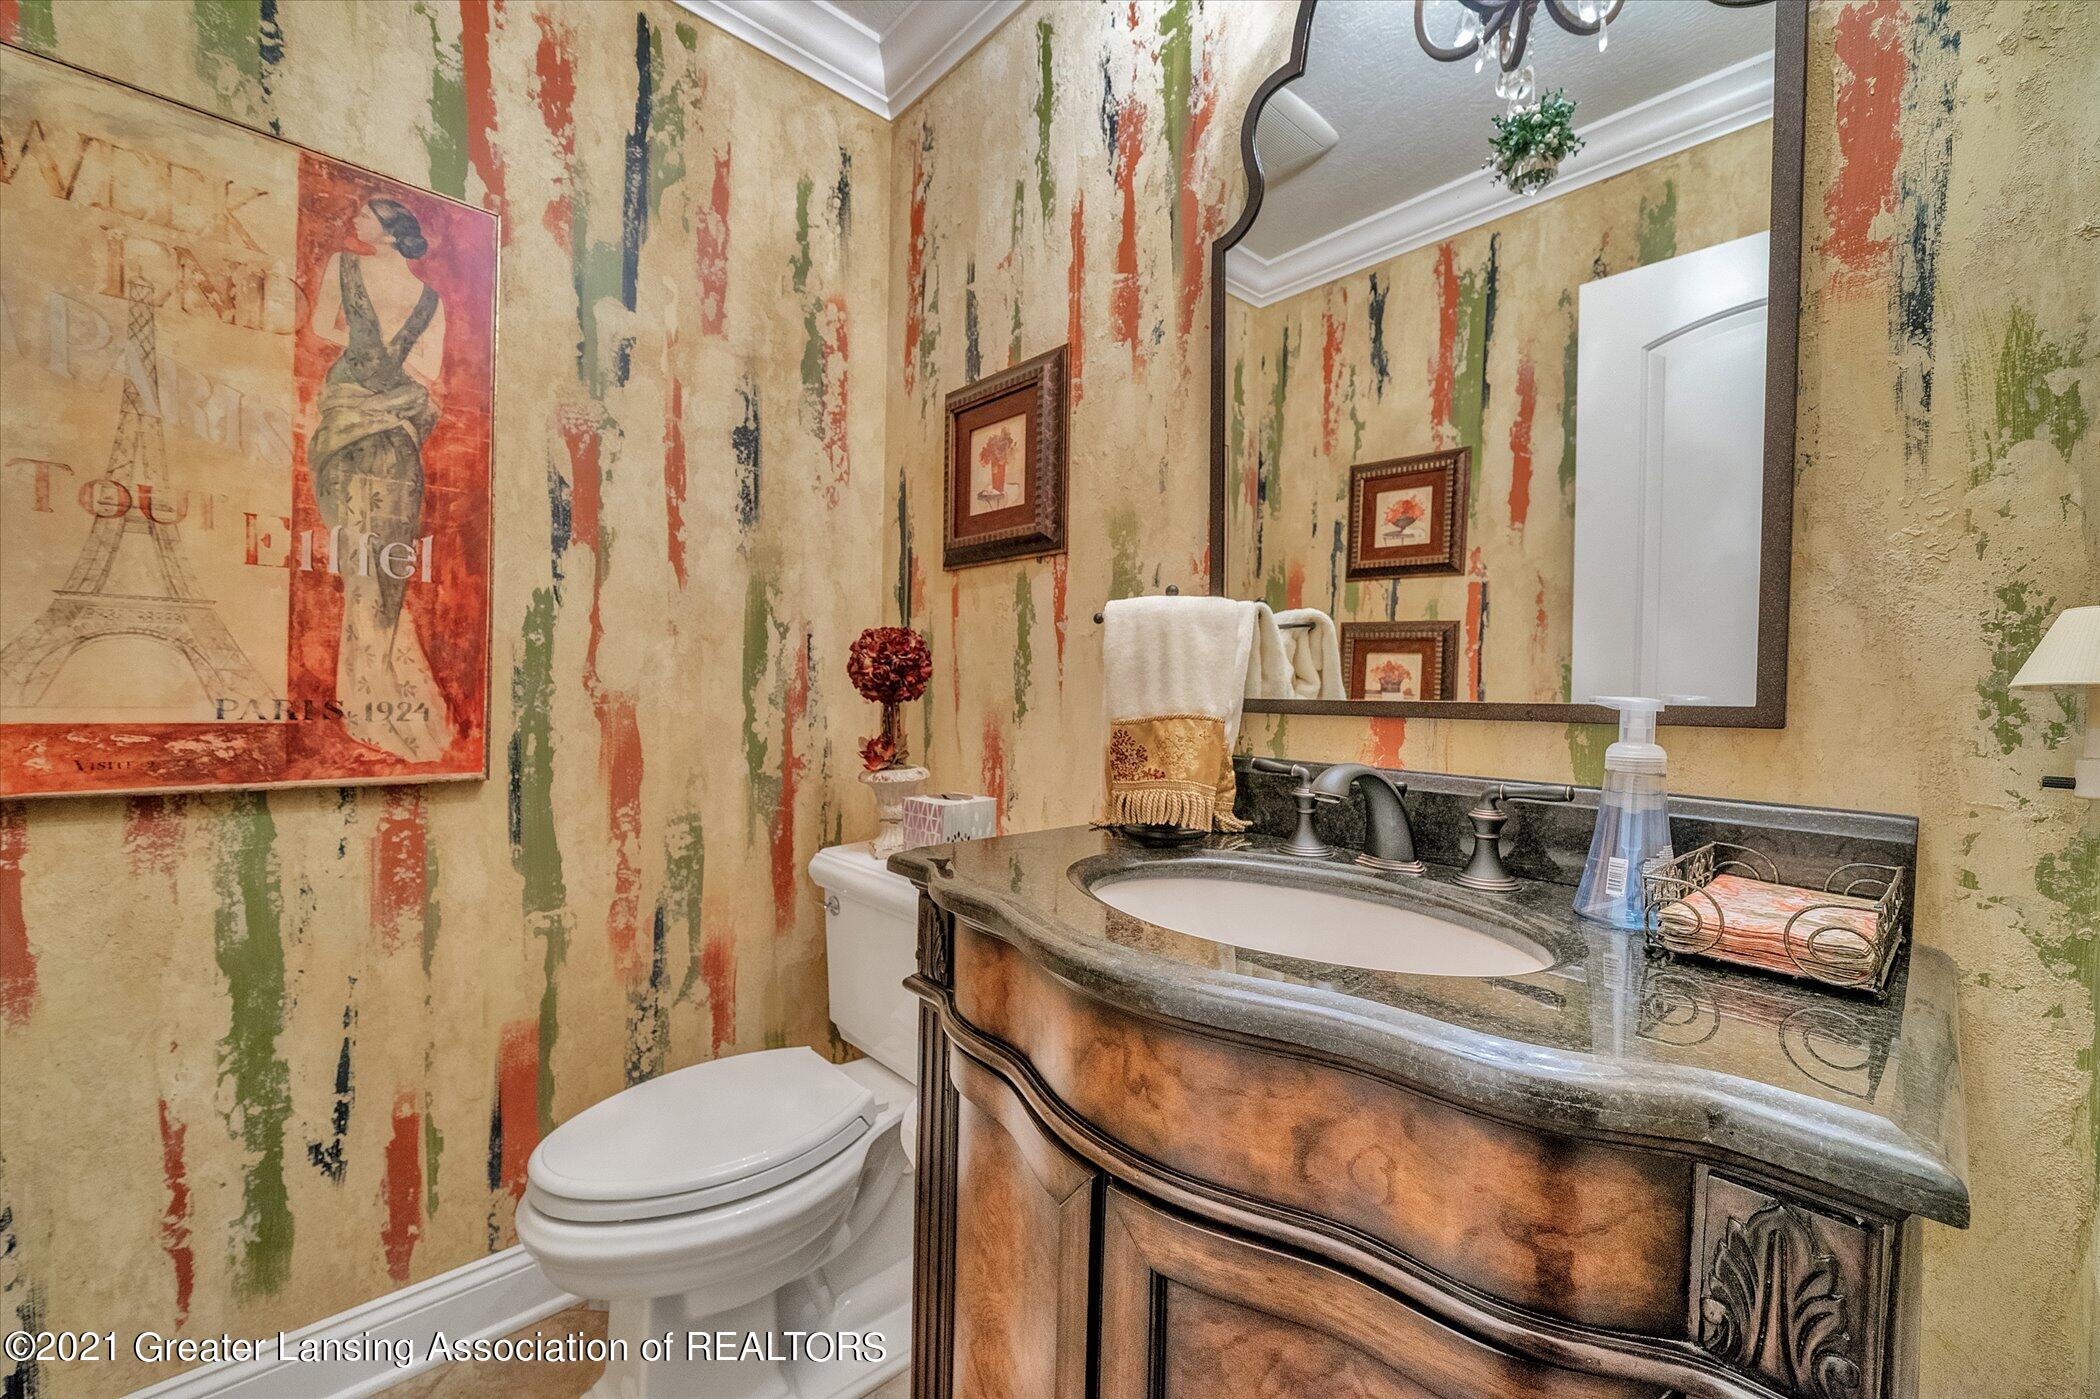 6330 Pine Hollow Dr - MAIN FLOOR Half Bathroom by Laund - 39